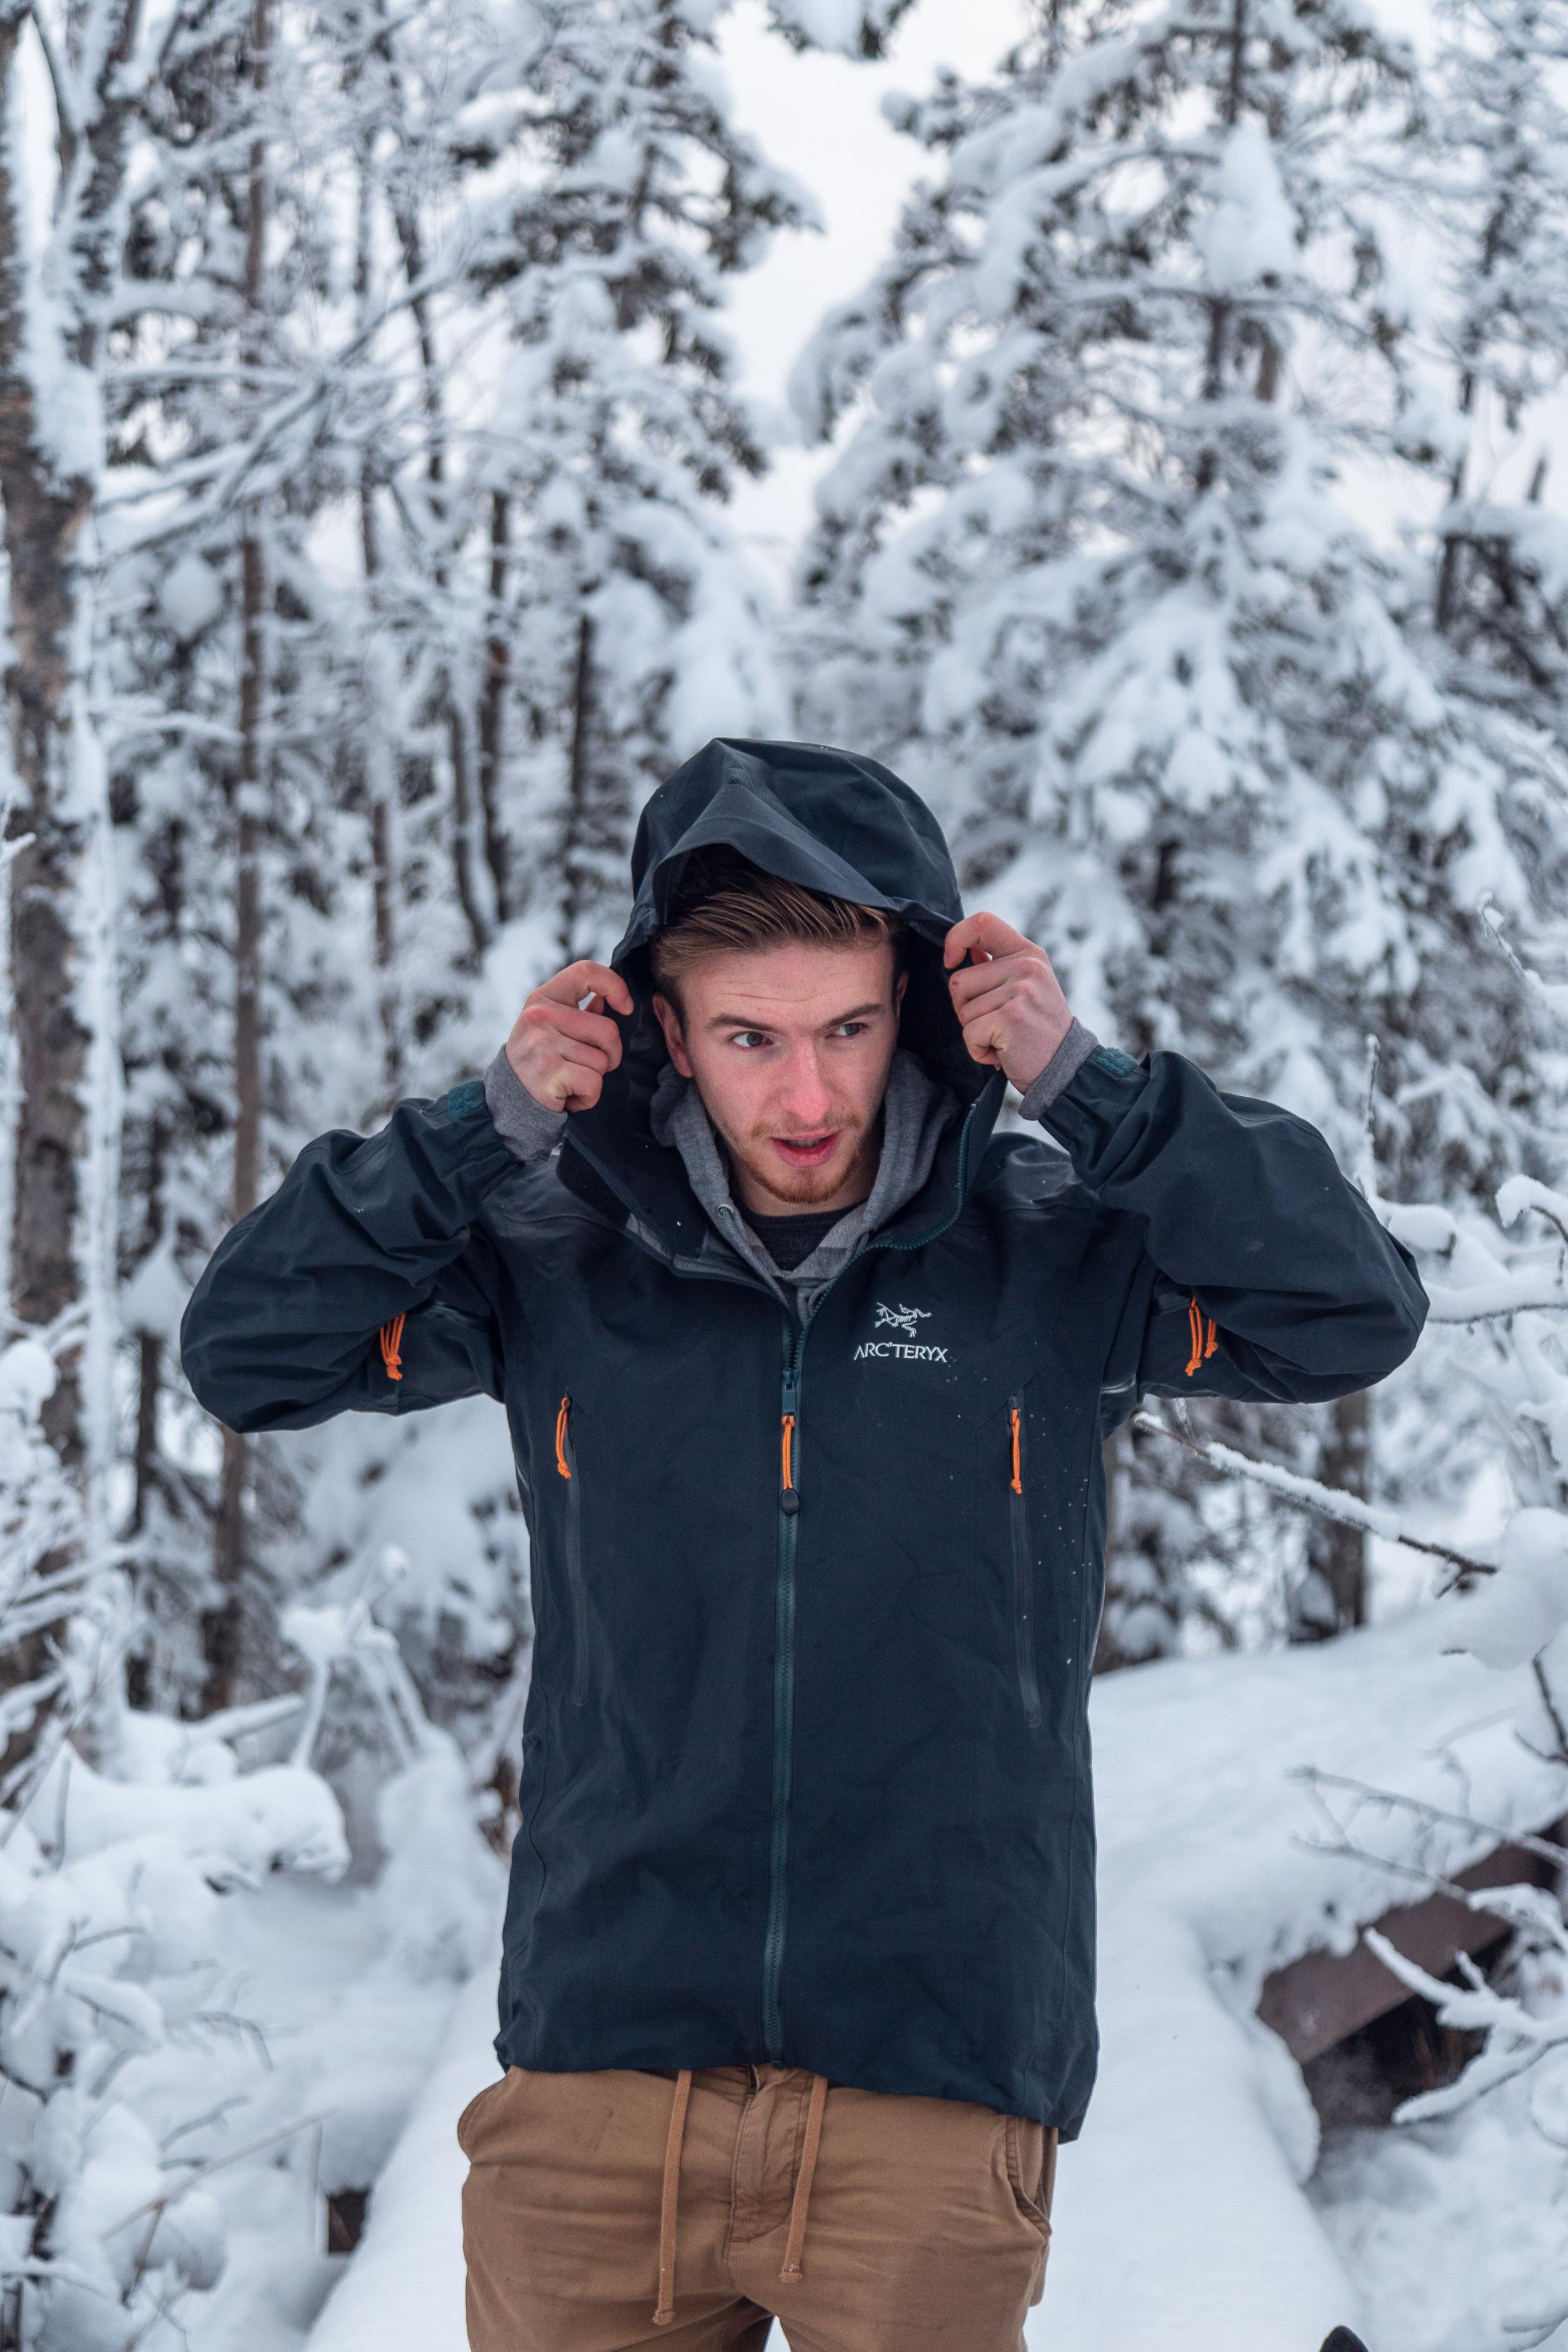 Adventure-Portrait-Photographer-2.jpg